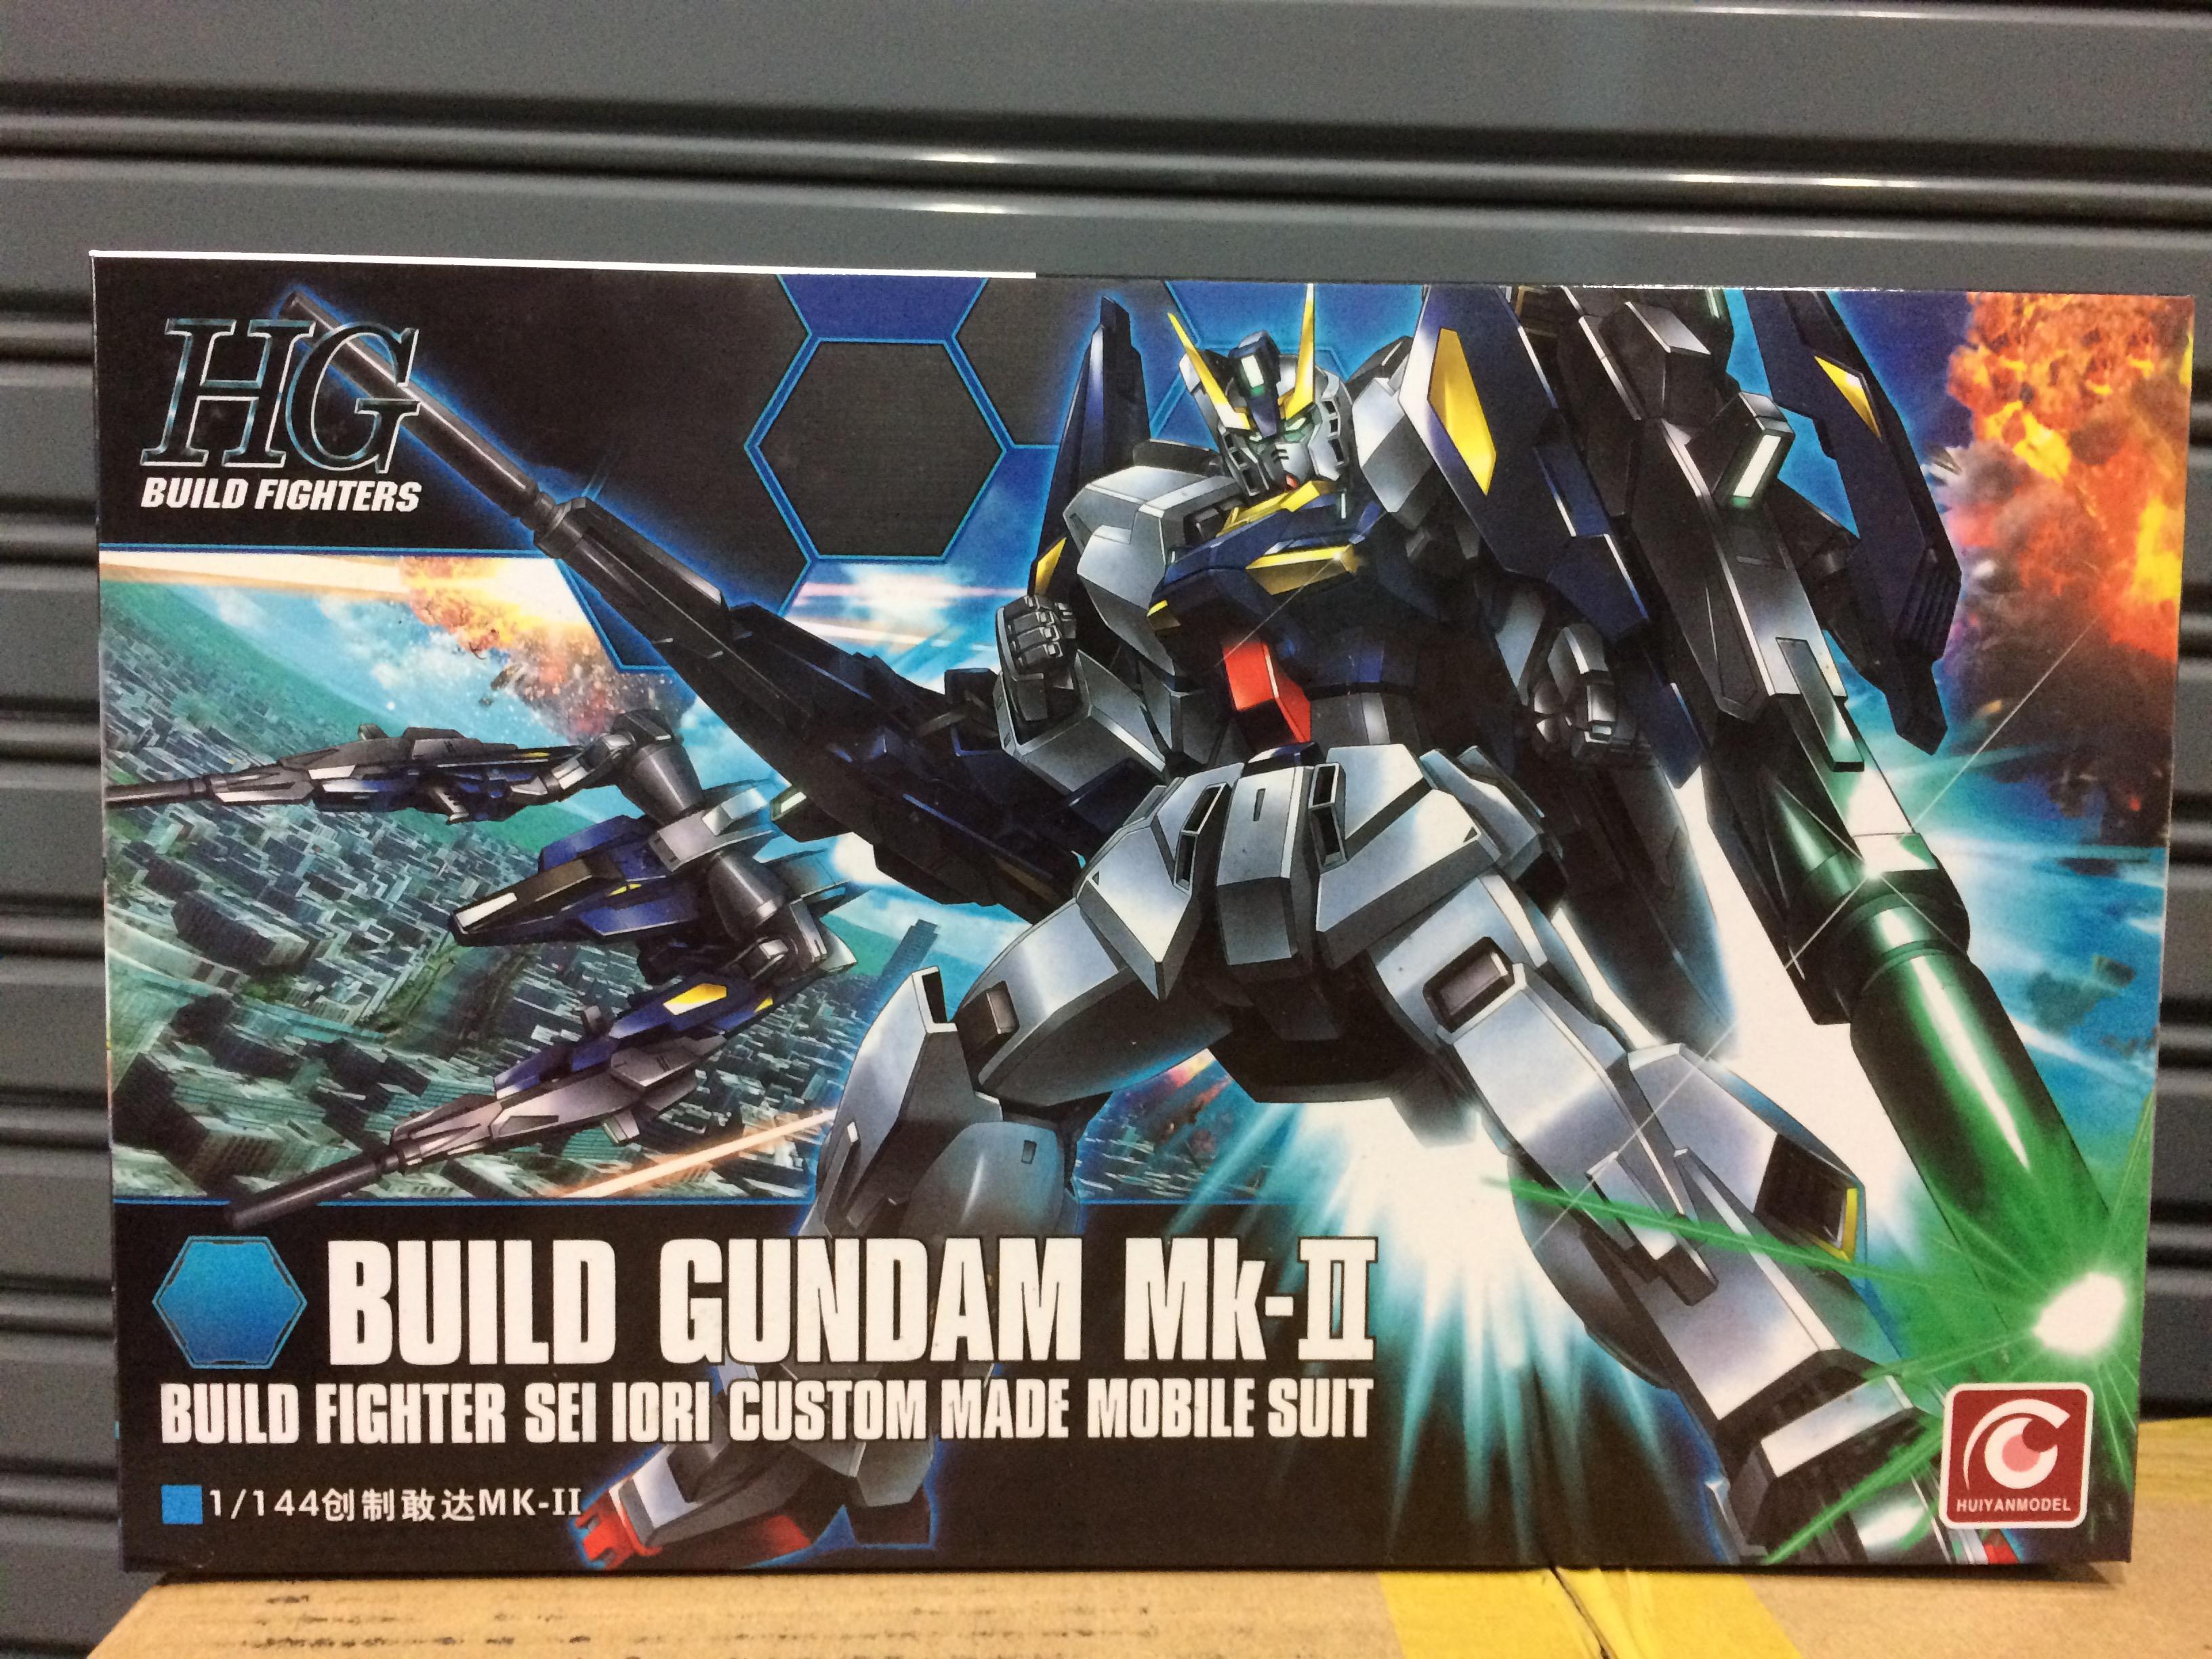 BUILD GUNDAM MK-II